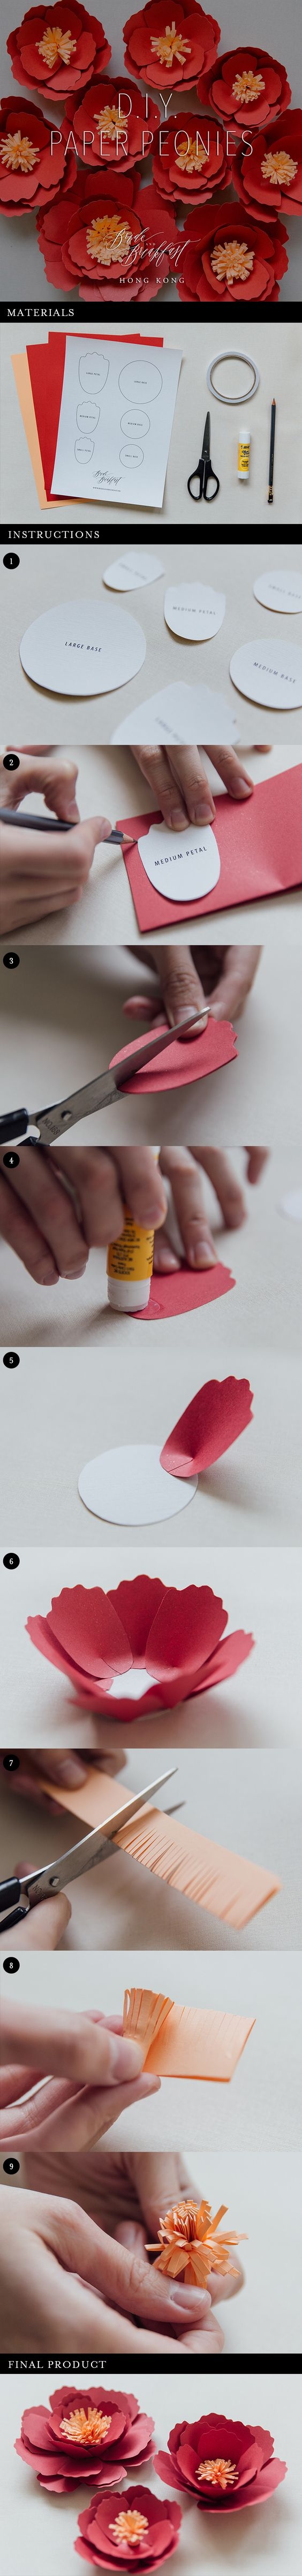 DIY Paper Peonies.